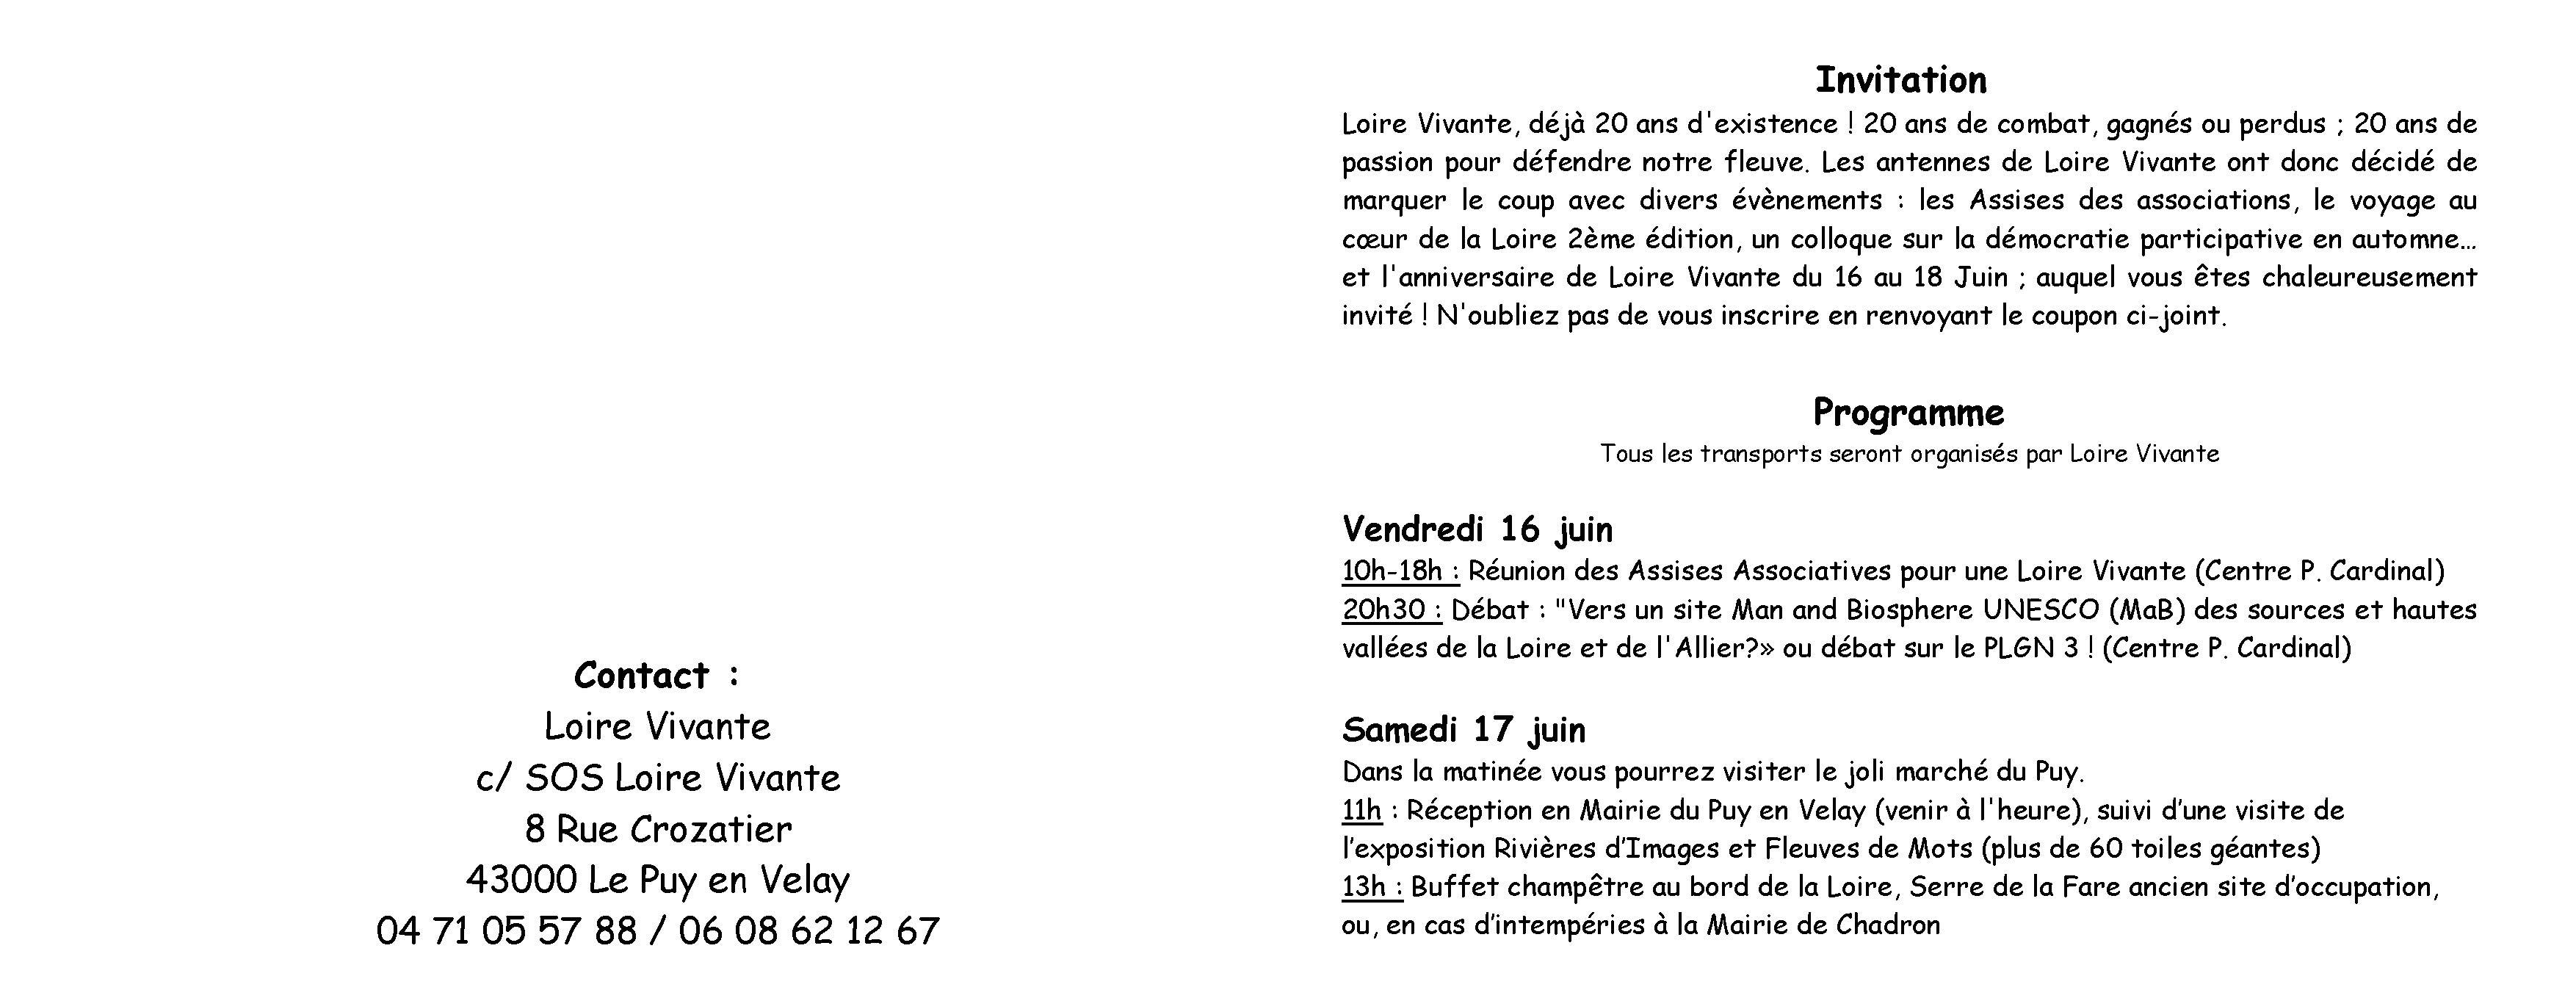 Modele Invitation Anniversaire 18 Ans Humoristique Document Online